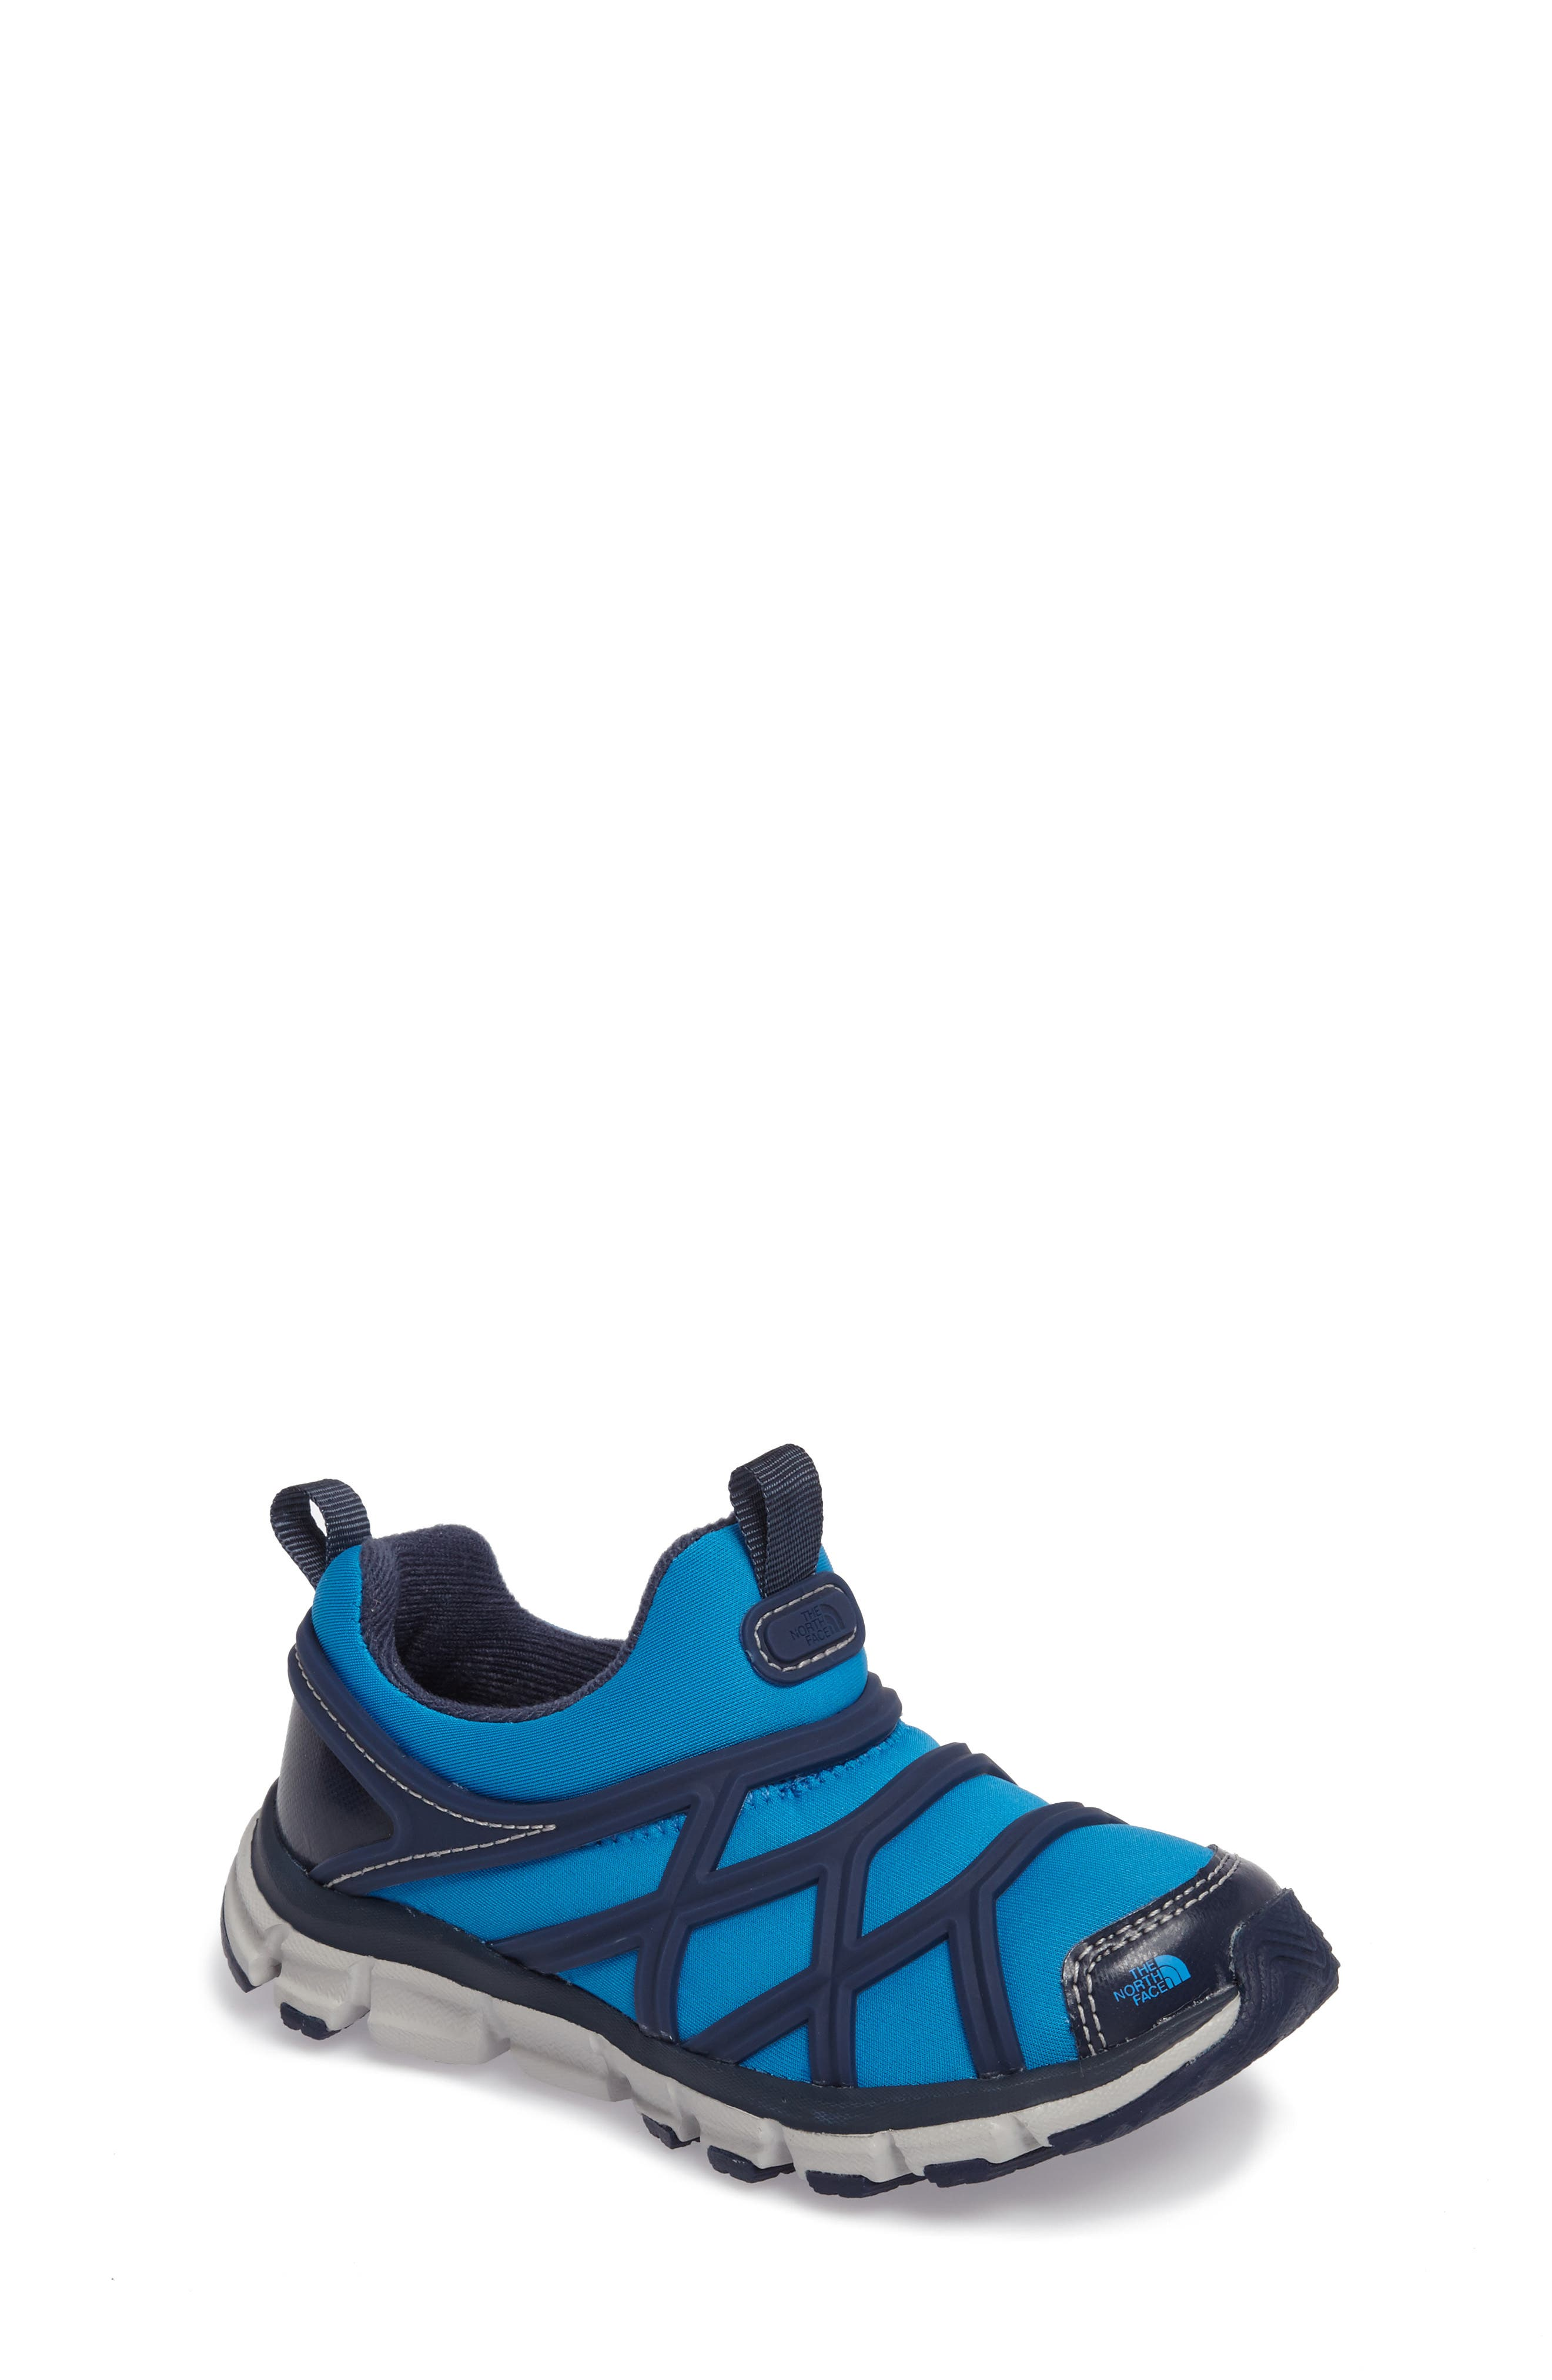 The North Face Liteweave Water-Resistant Slip-On Sneaker (Toddler & Little Kid)